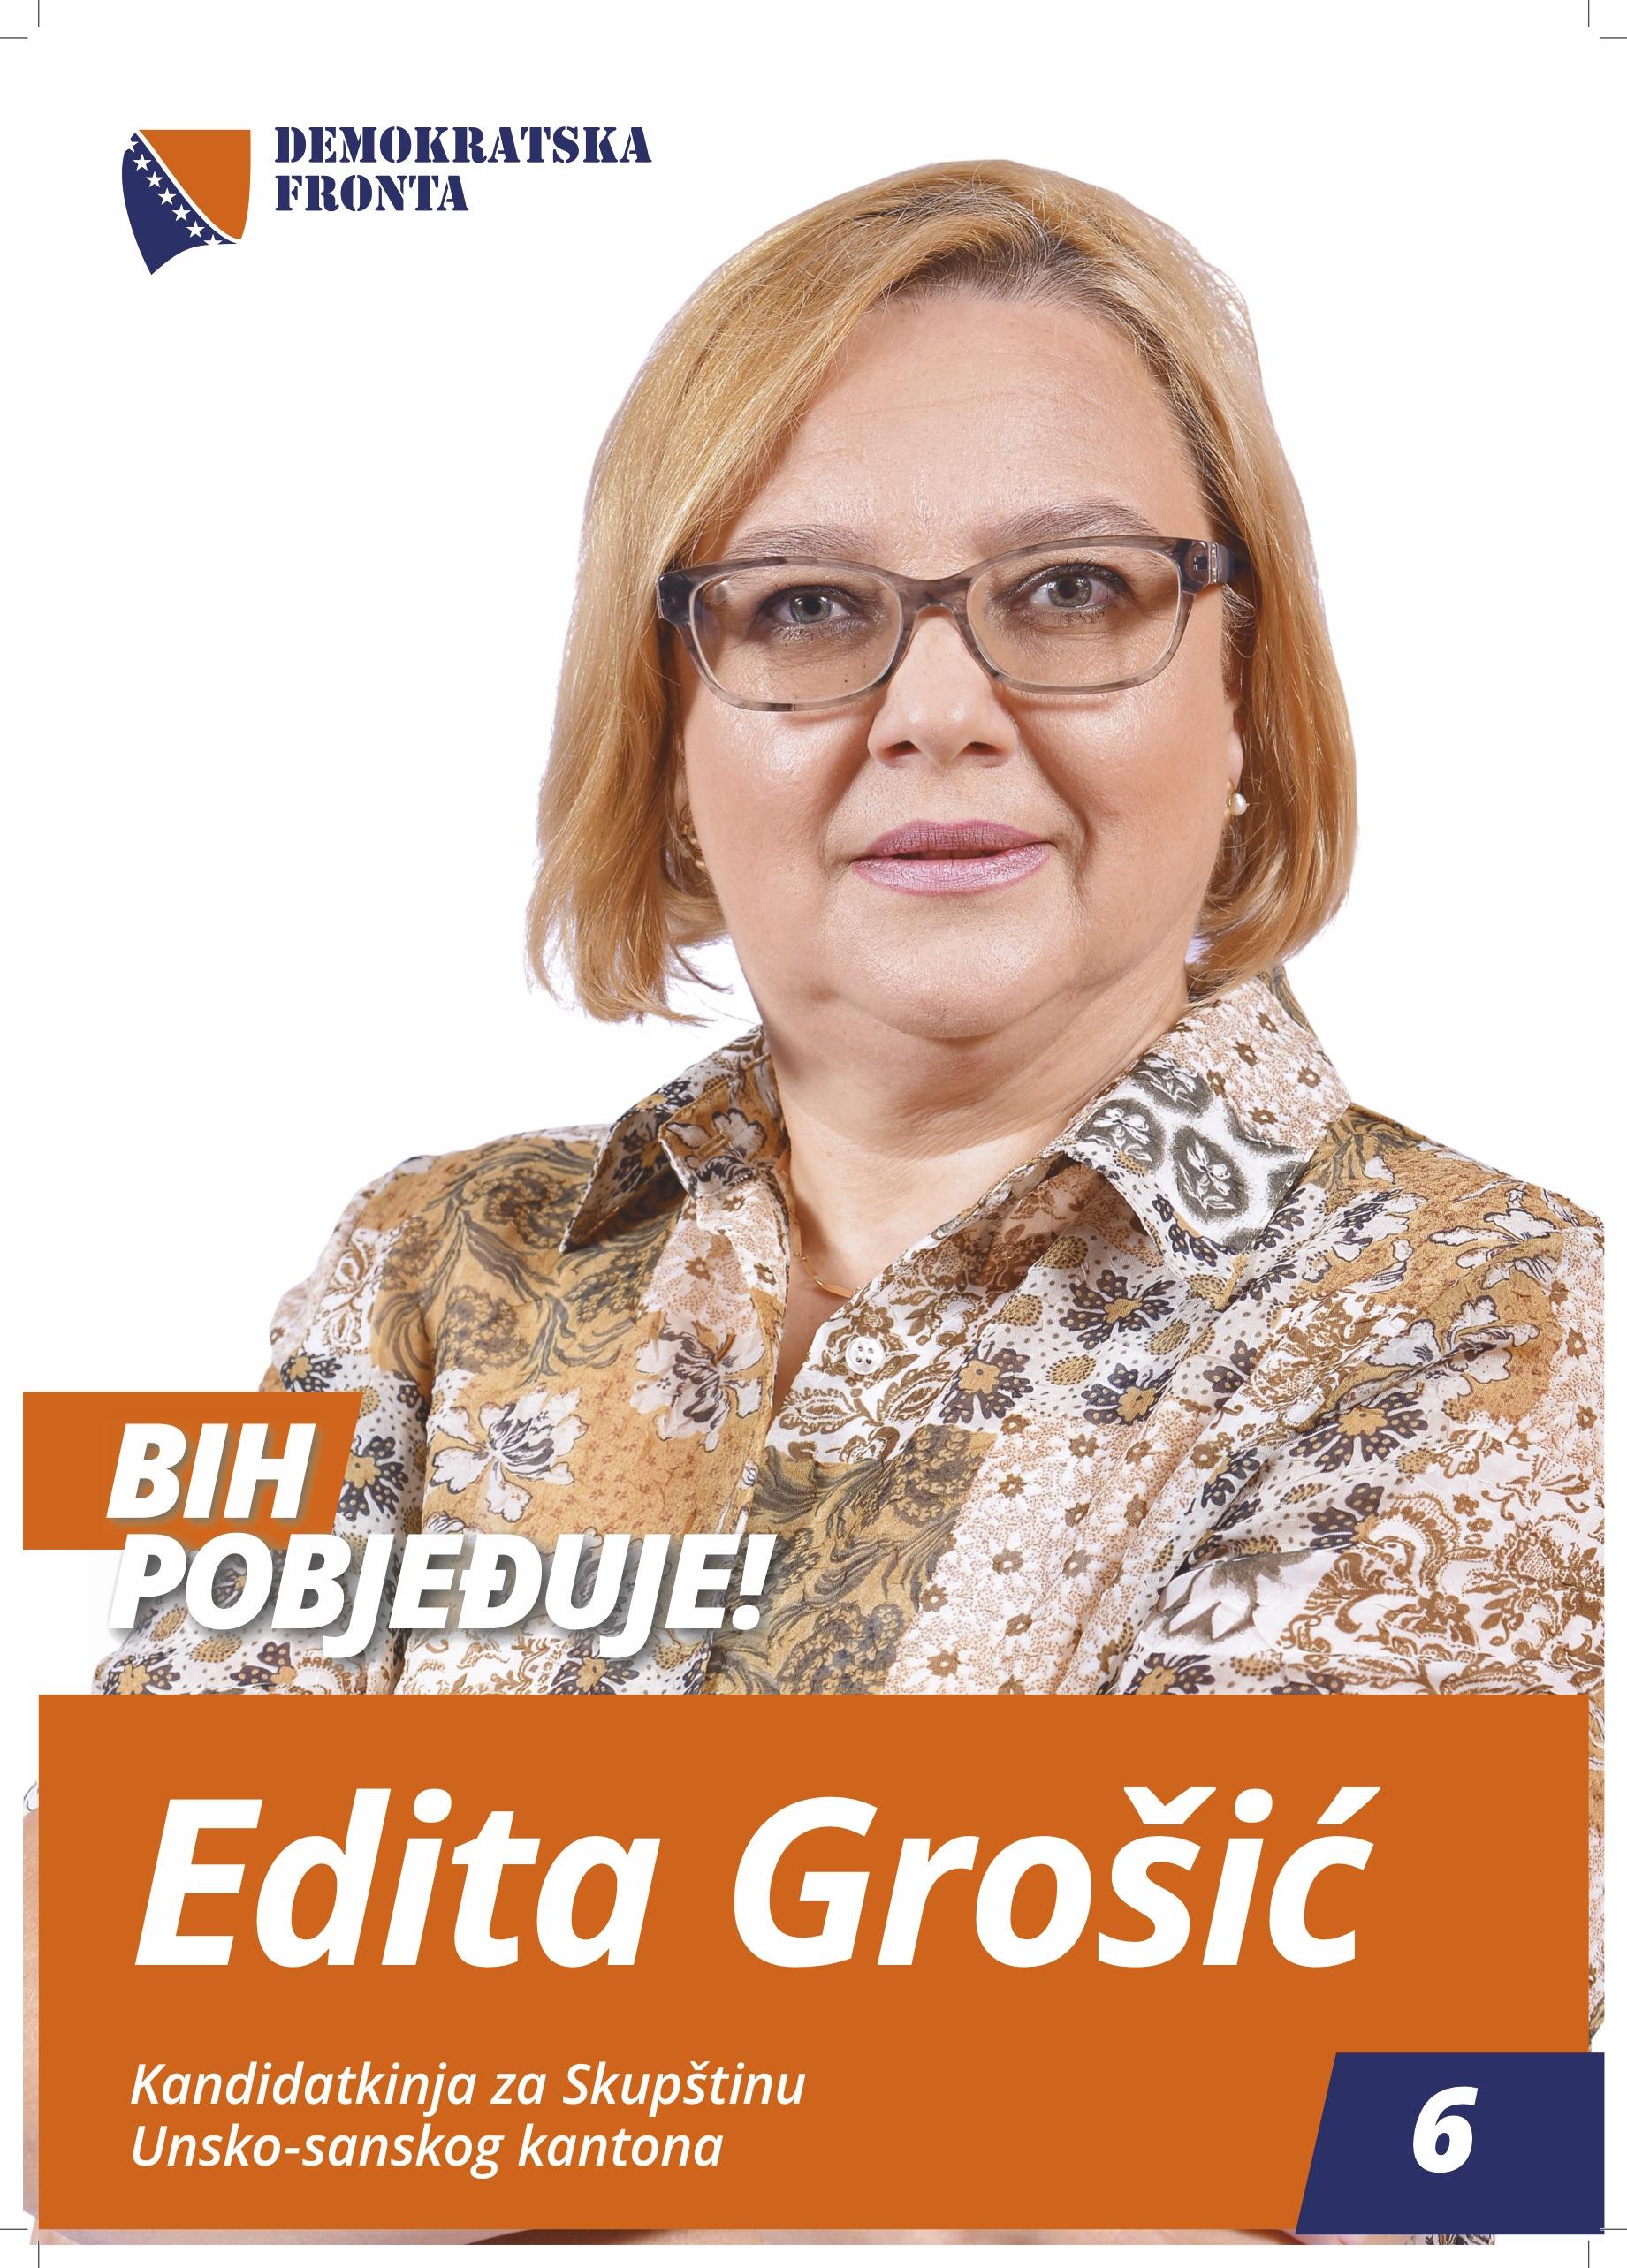 Edita Grošić, diplomirani inžinjer poljoprivrede